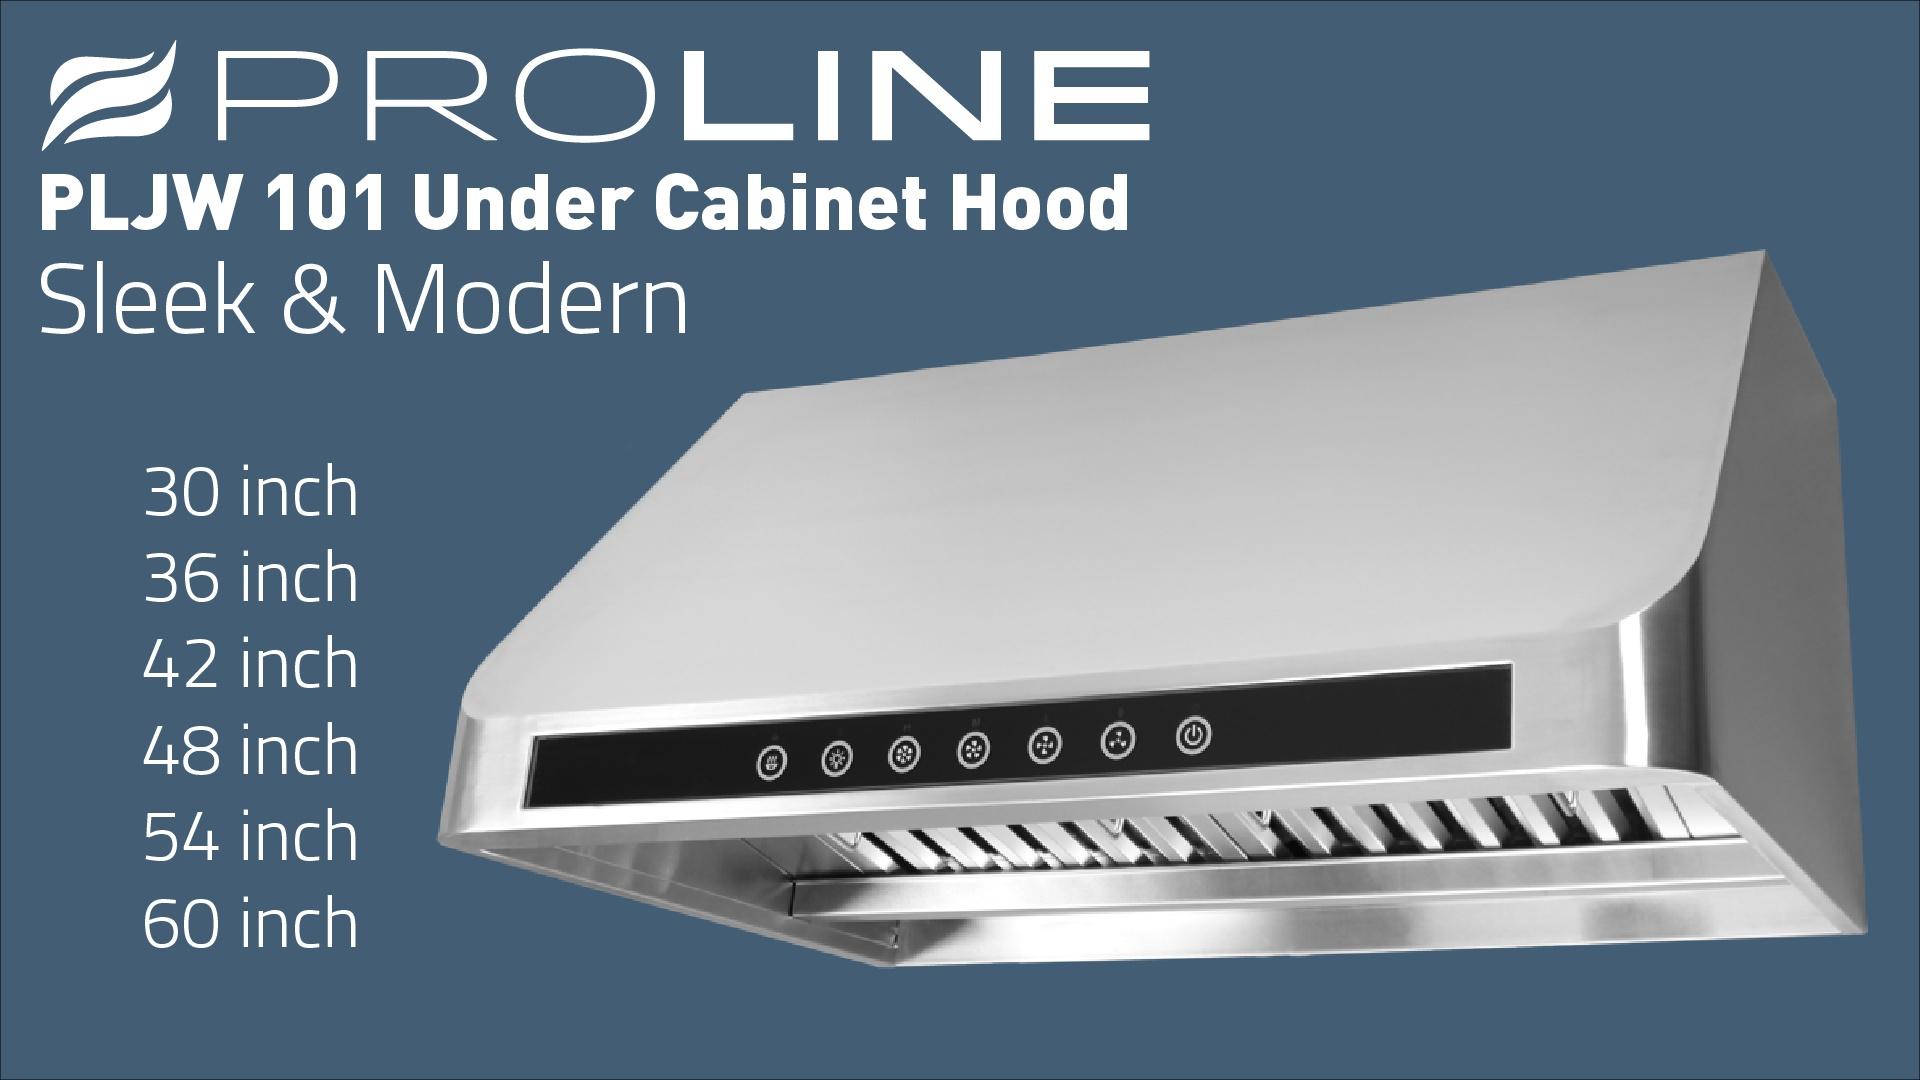 Proline range hood reviews - Proline Range Hood Reviews 42